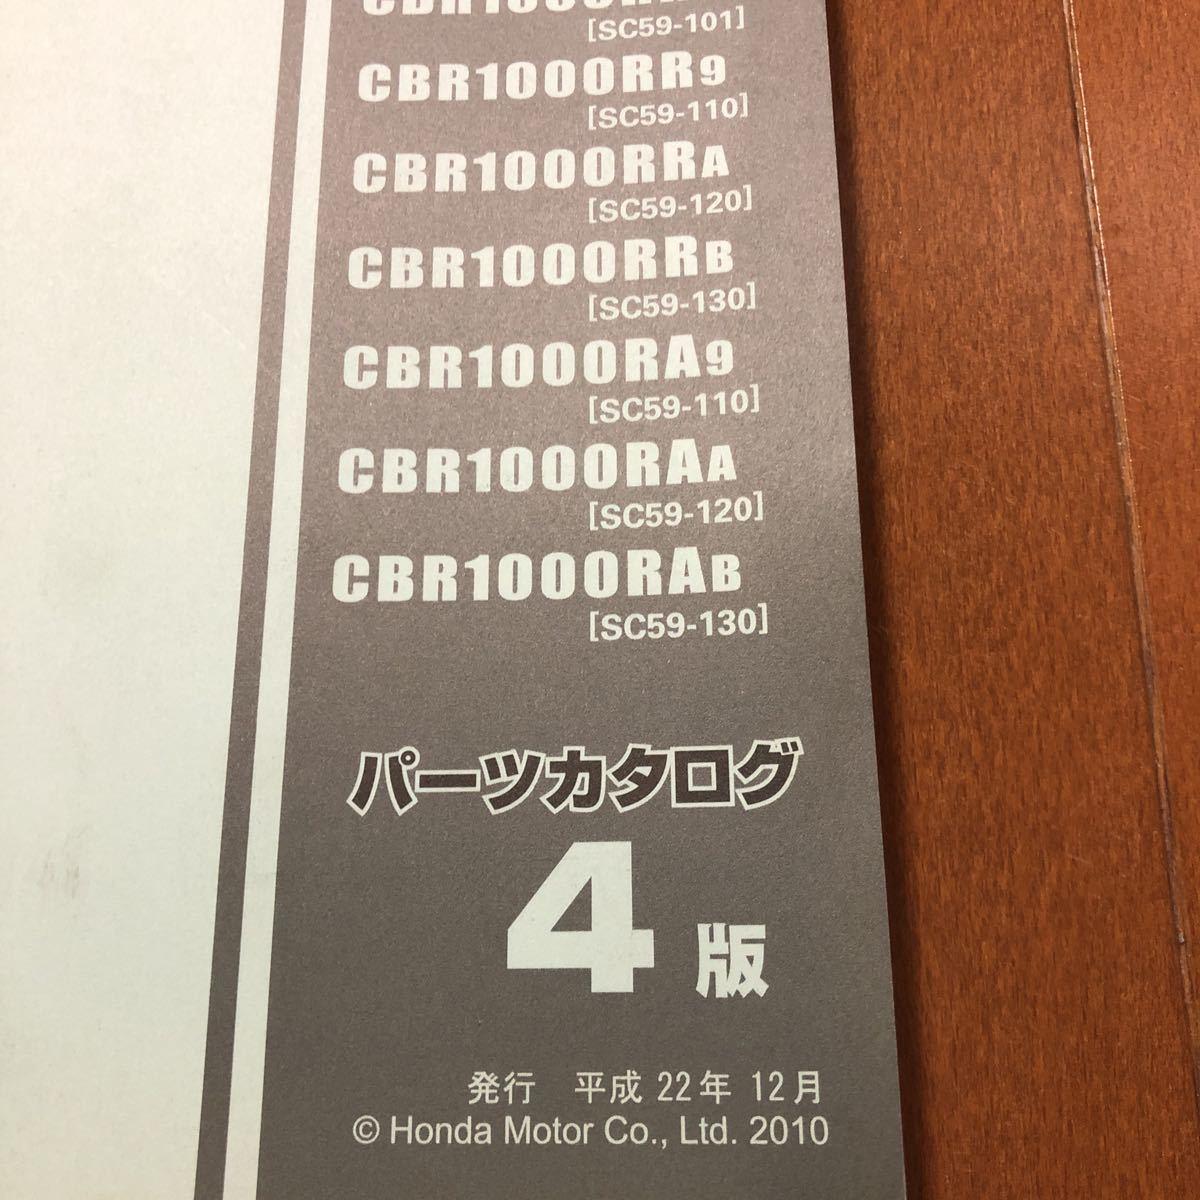 CBR1000RR SC59 パーツカタログ 即決価格で送料無料です_画像2